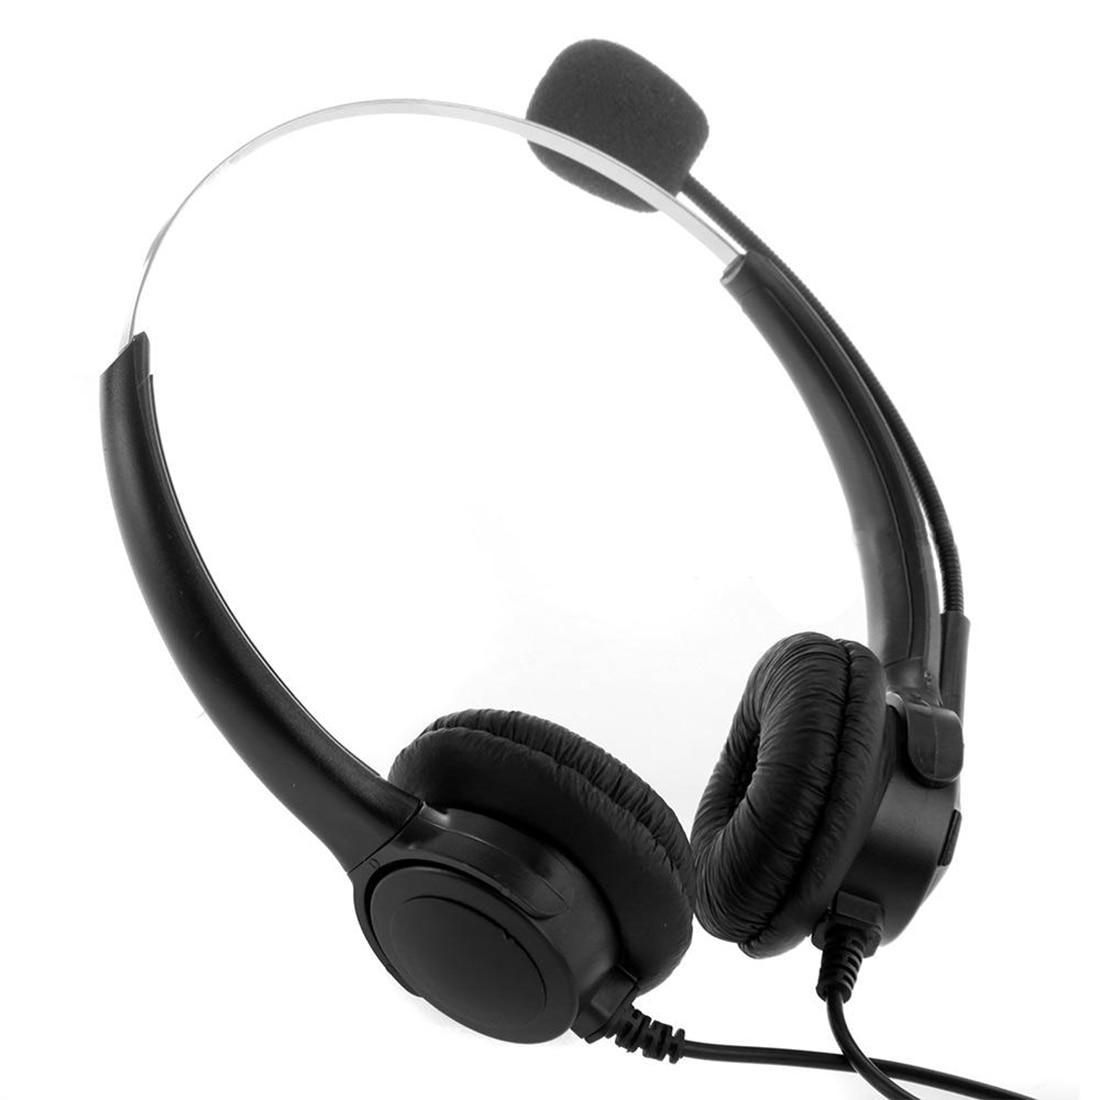 Marsnaska Brand New Fashion 4-Pin Call Center Corded Operator Telephone Headset High Quality Headphones with Microphone marsnaska fashion new high quality white